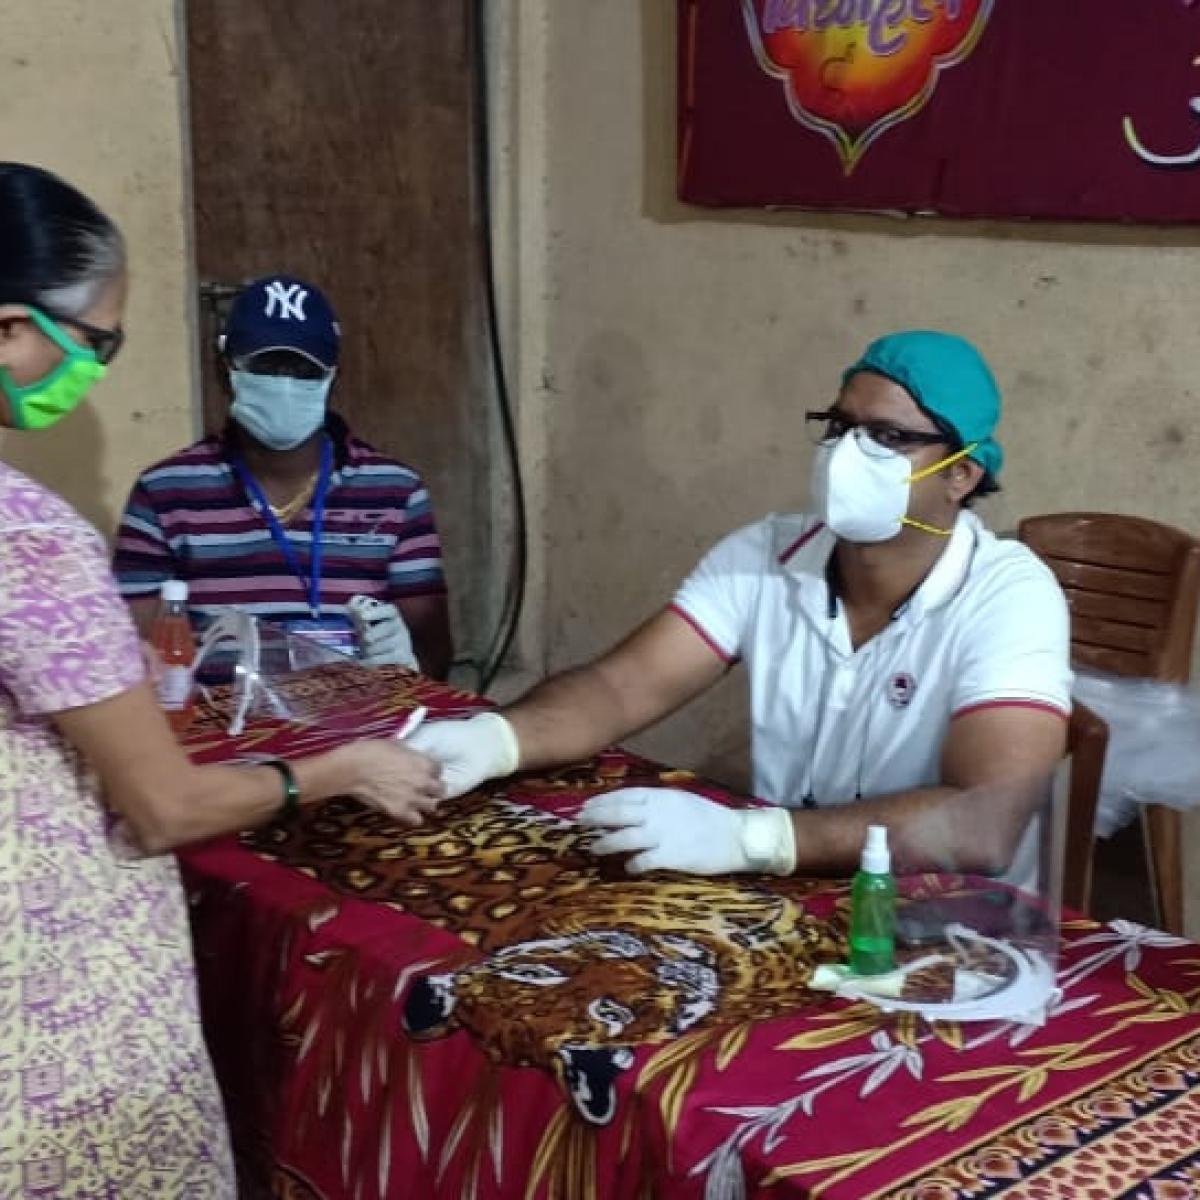 Corona heroes from Mumbai: Meet the  Sewri doctor who conducted door-to-door surveys and screened 30,000 people